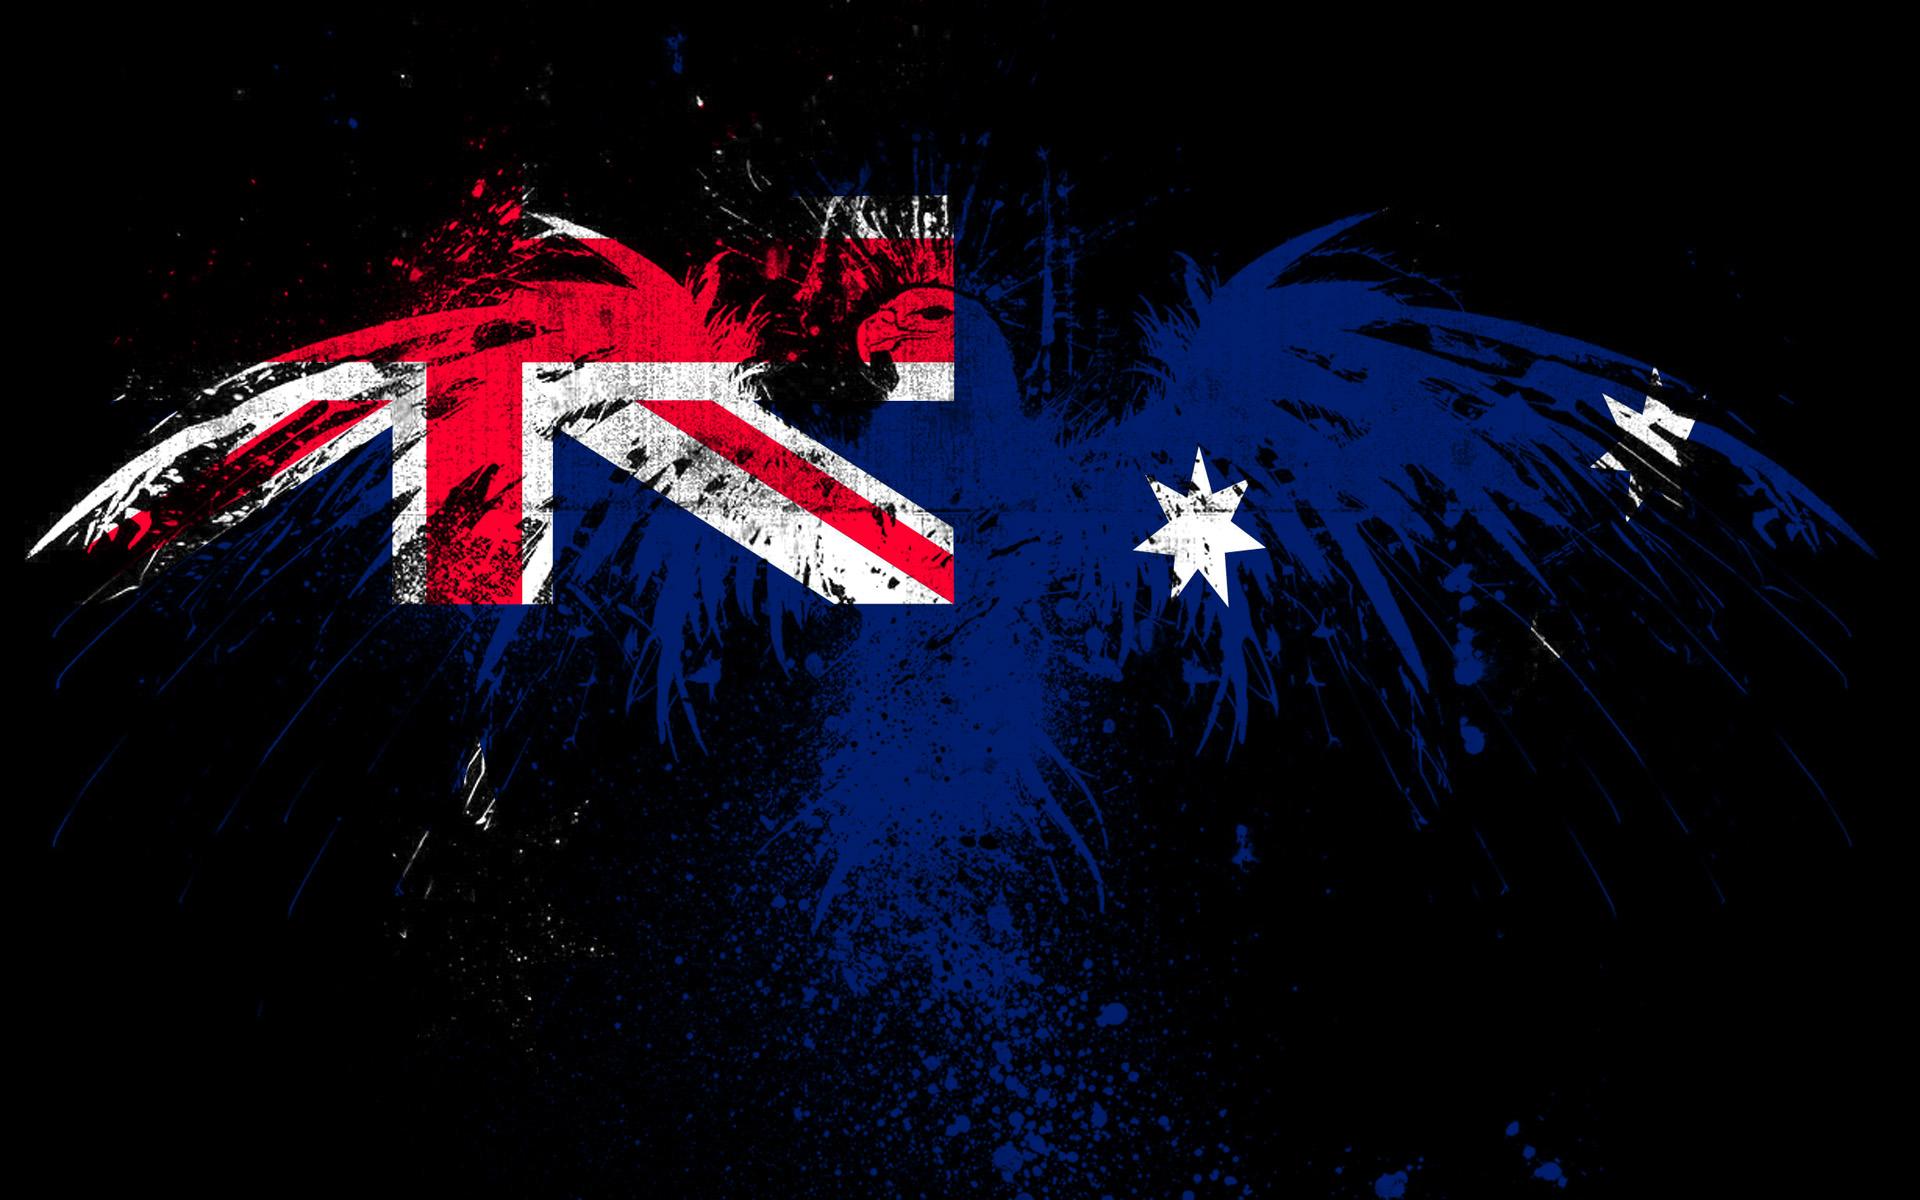 Ashley Wallpaper: australian flag hd images free download